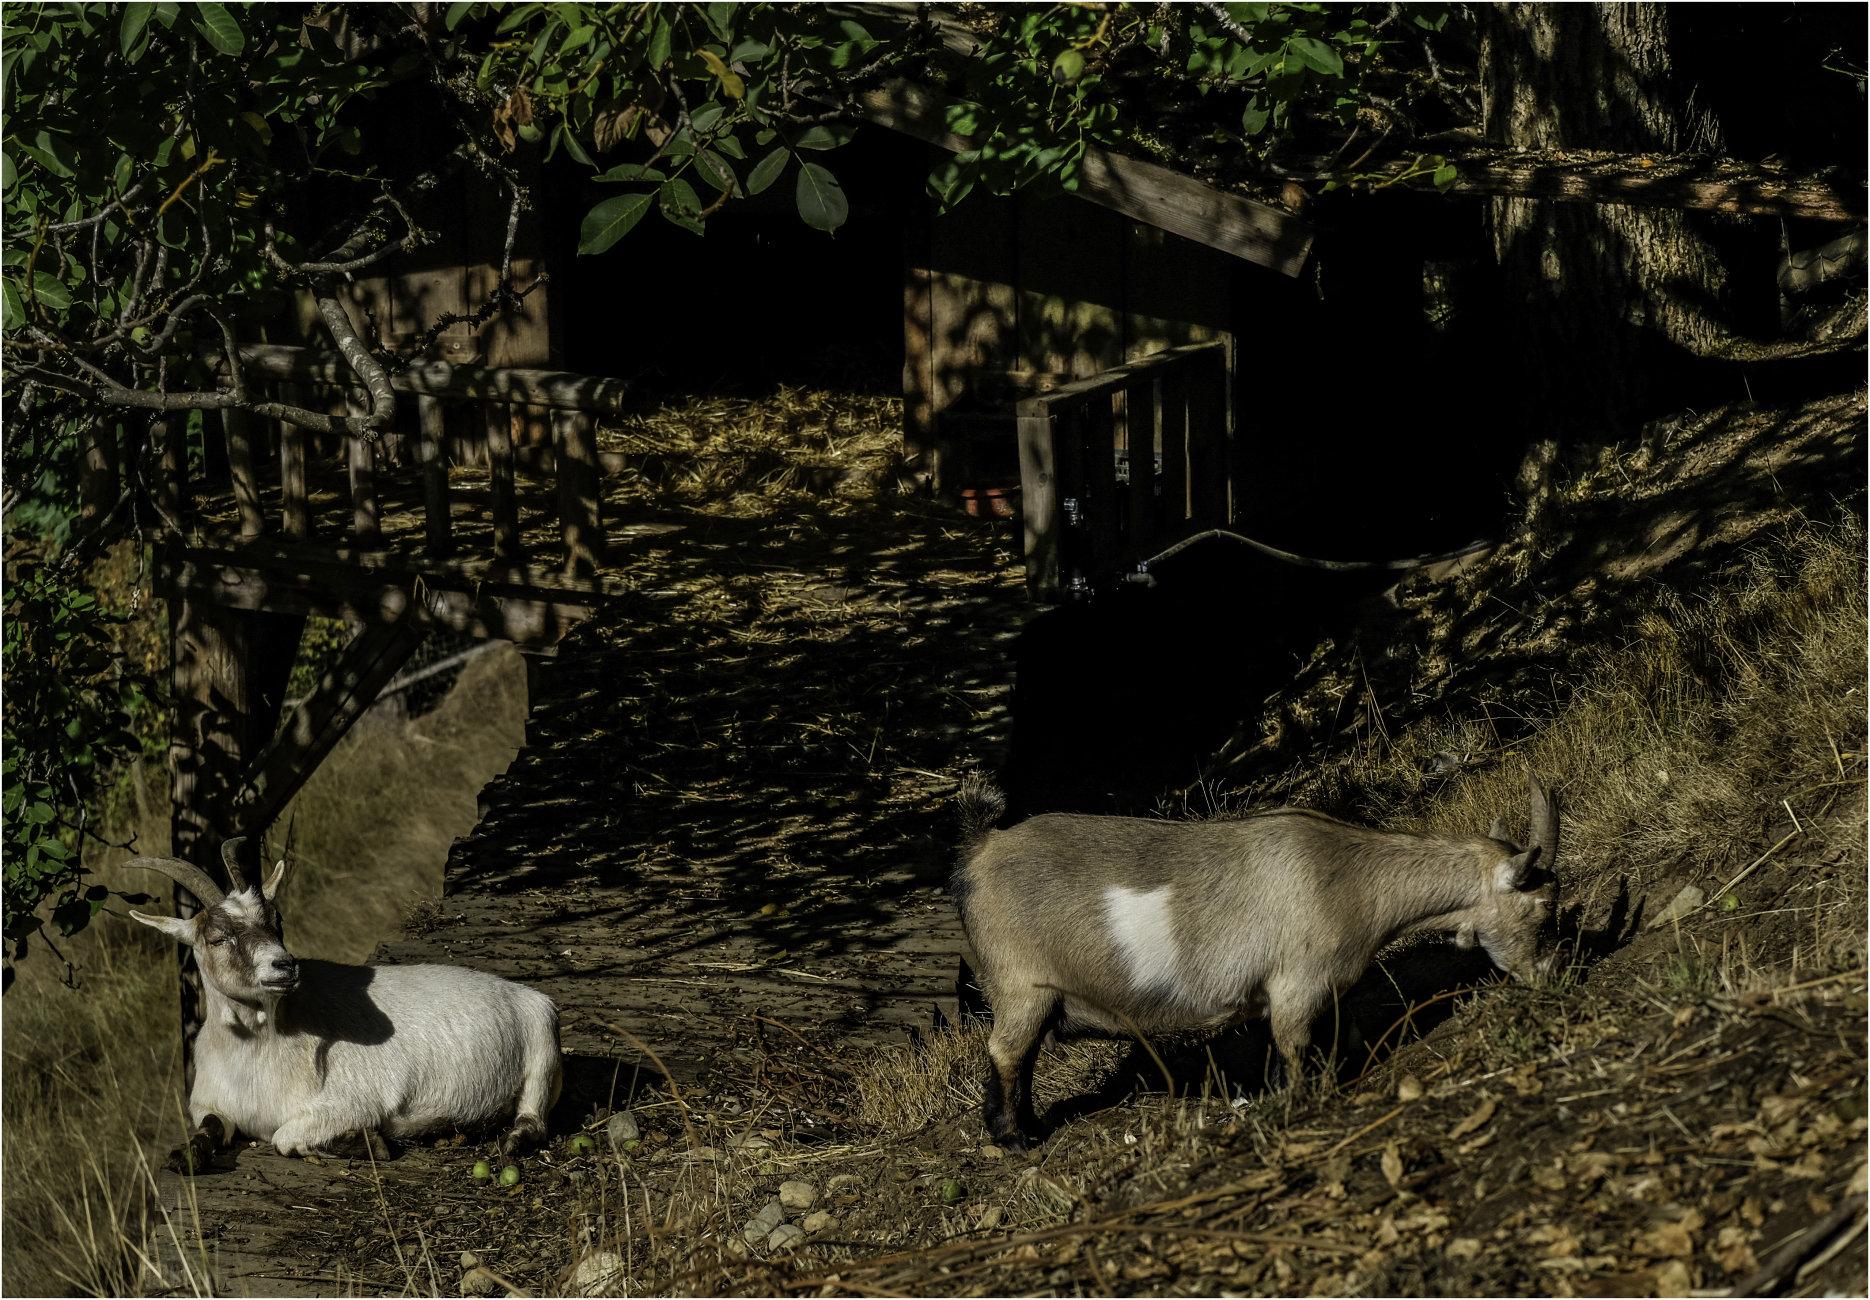 Chubby Goats